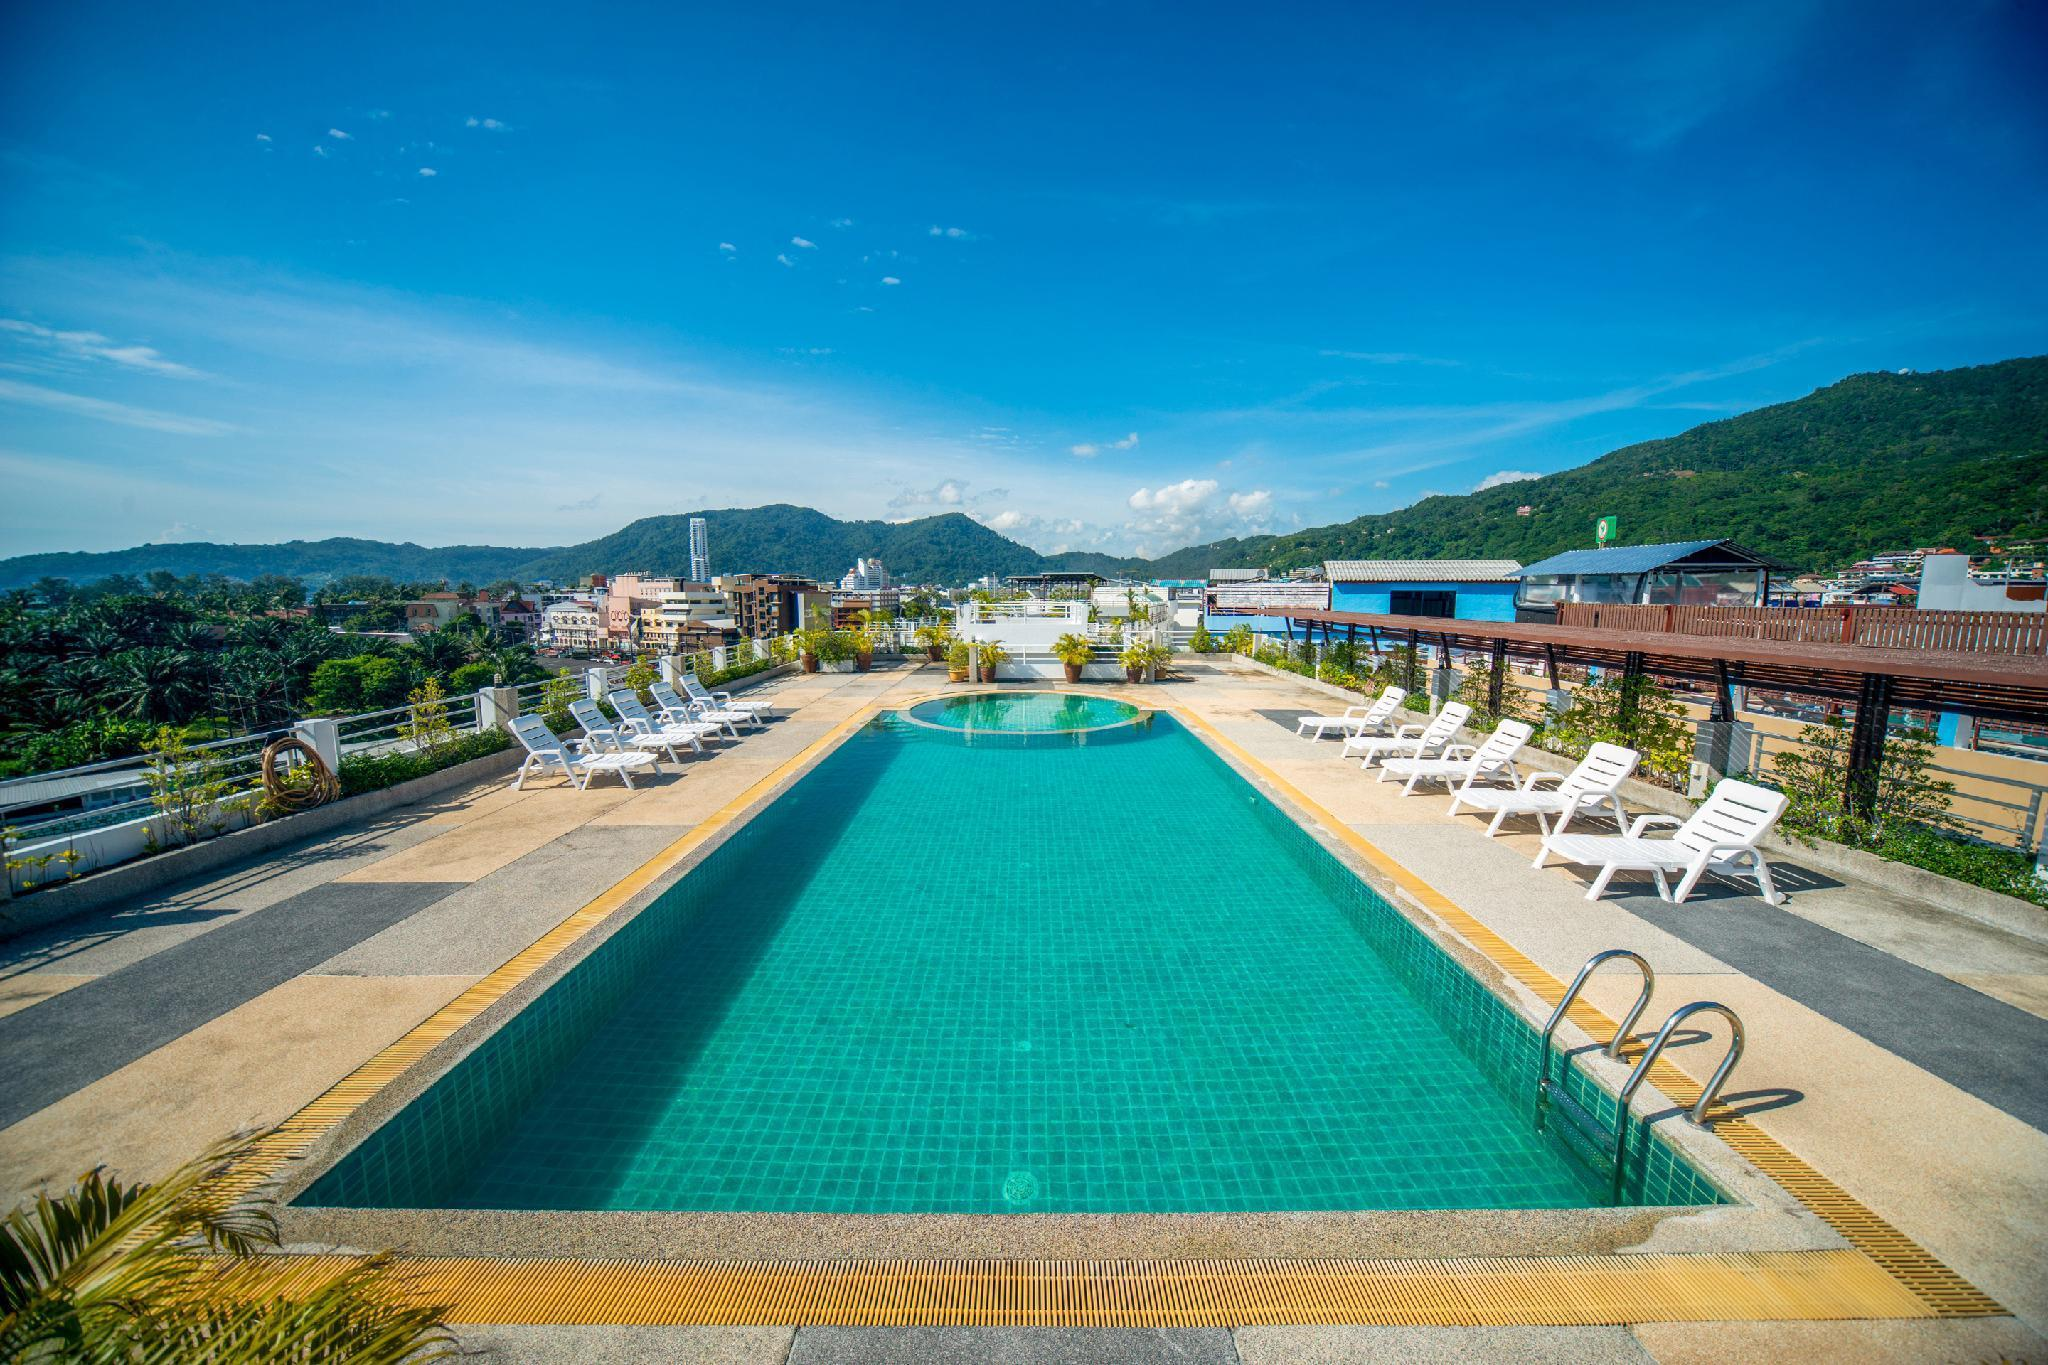 OYO 235 I Dee Hotel Patong โอโย 235 ไอ ดี โฮเต็ล ป่าตอง